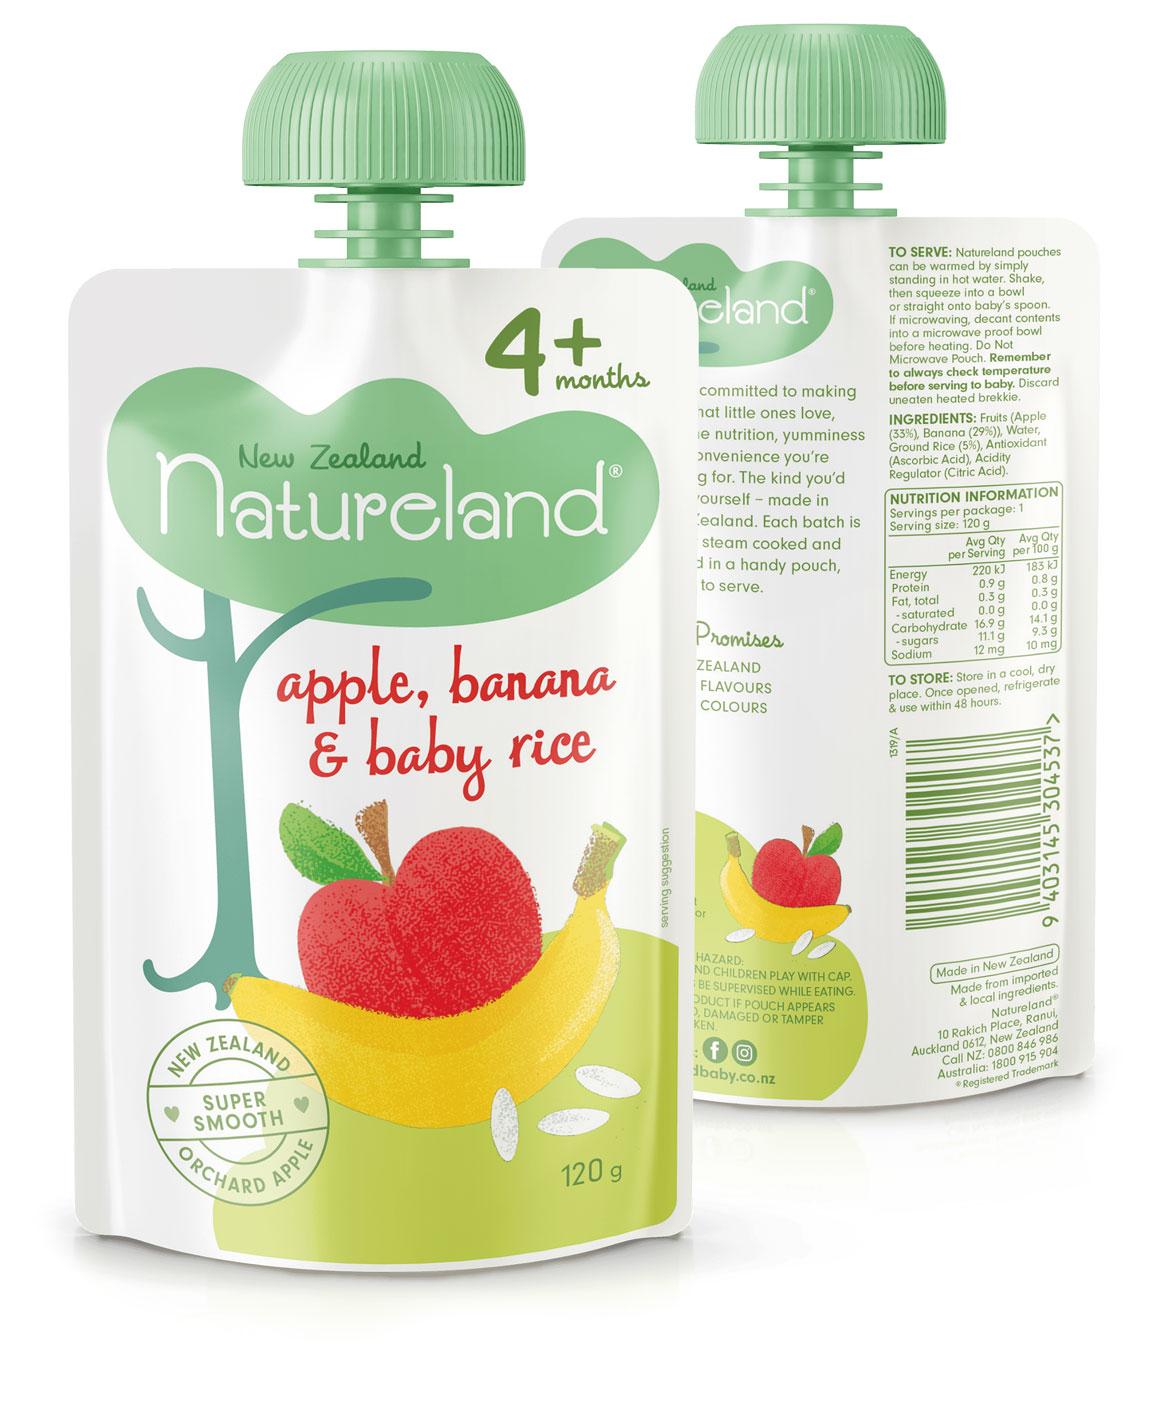 Natureland-120g-Apple-Banana-Rice.jpg